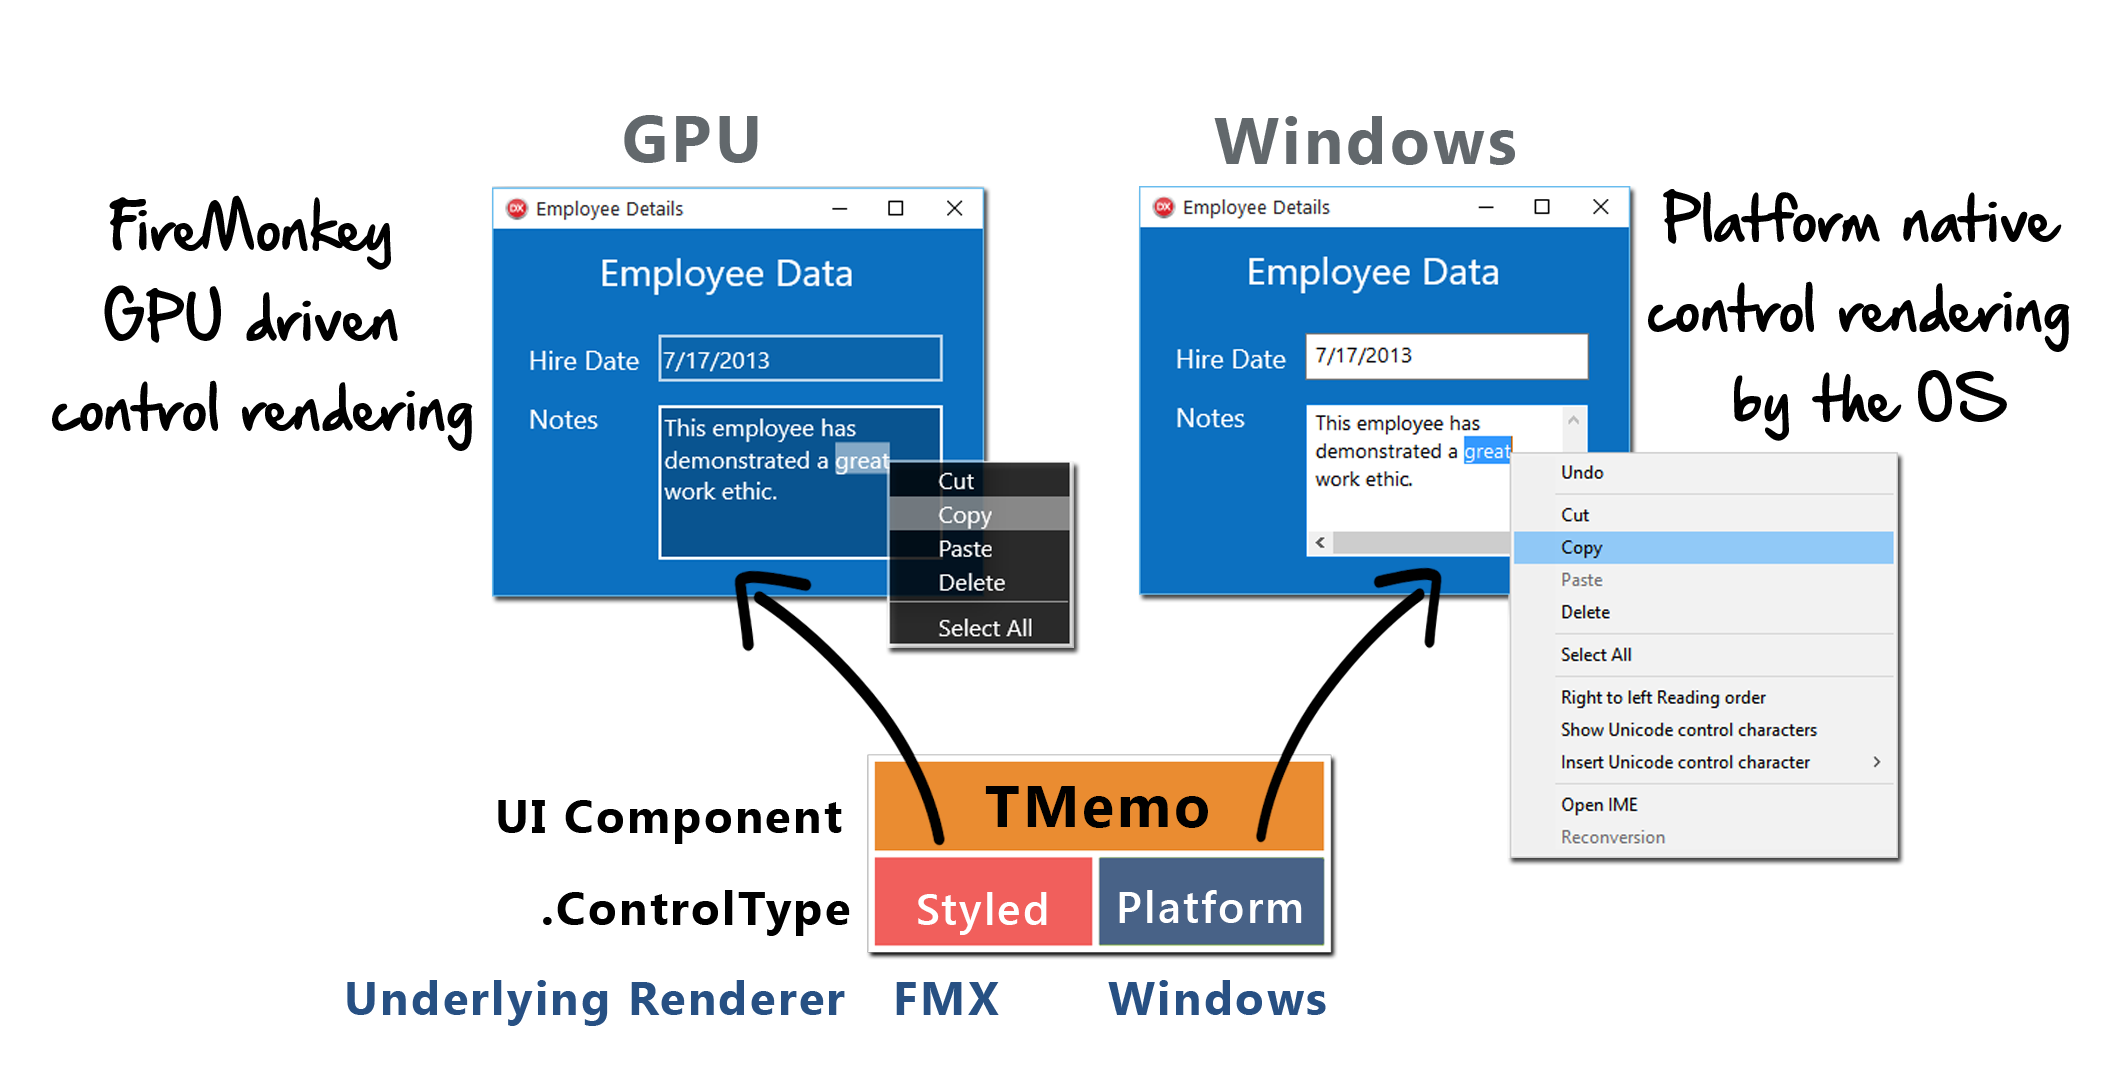 PlatformControls_WindowsDiagram